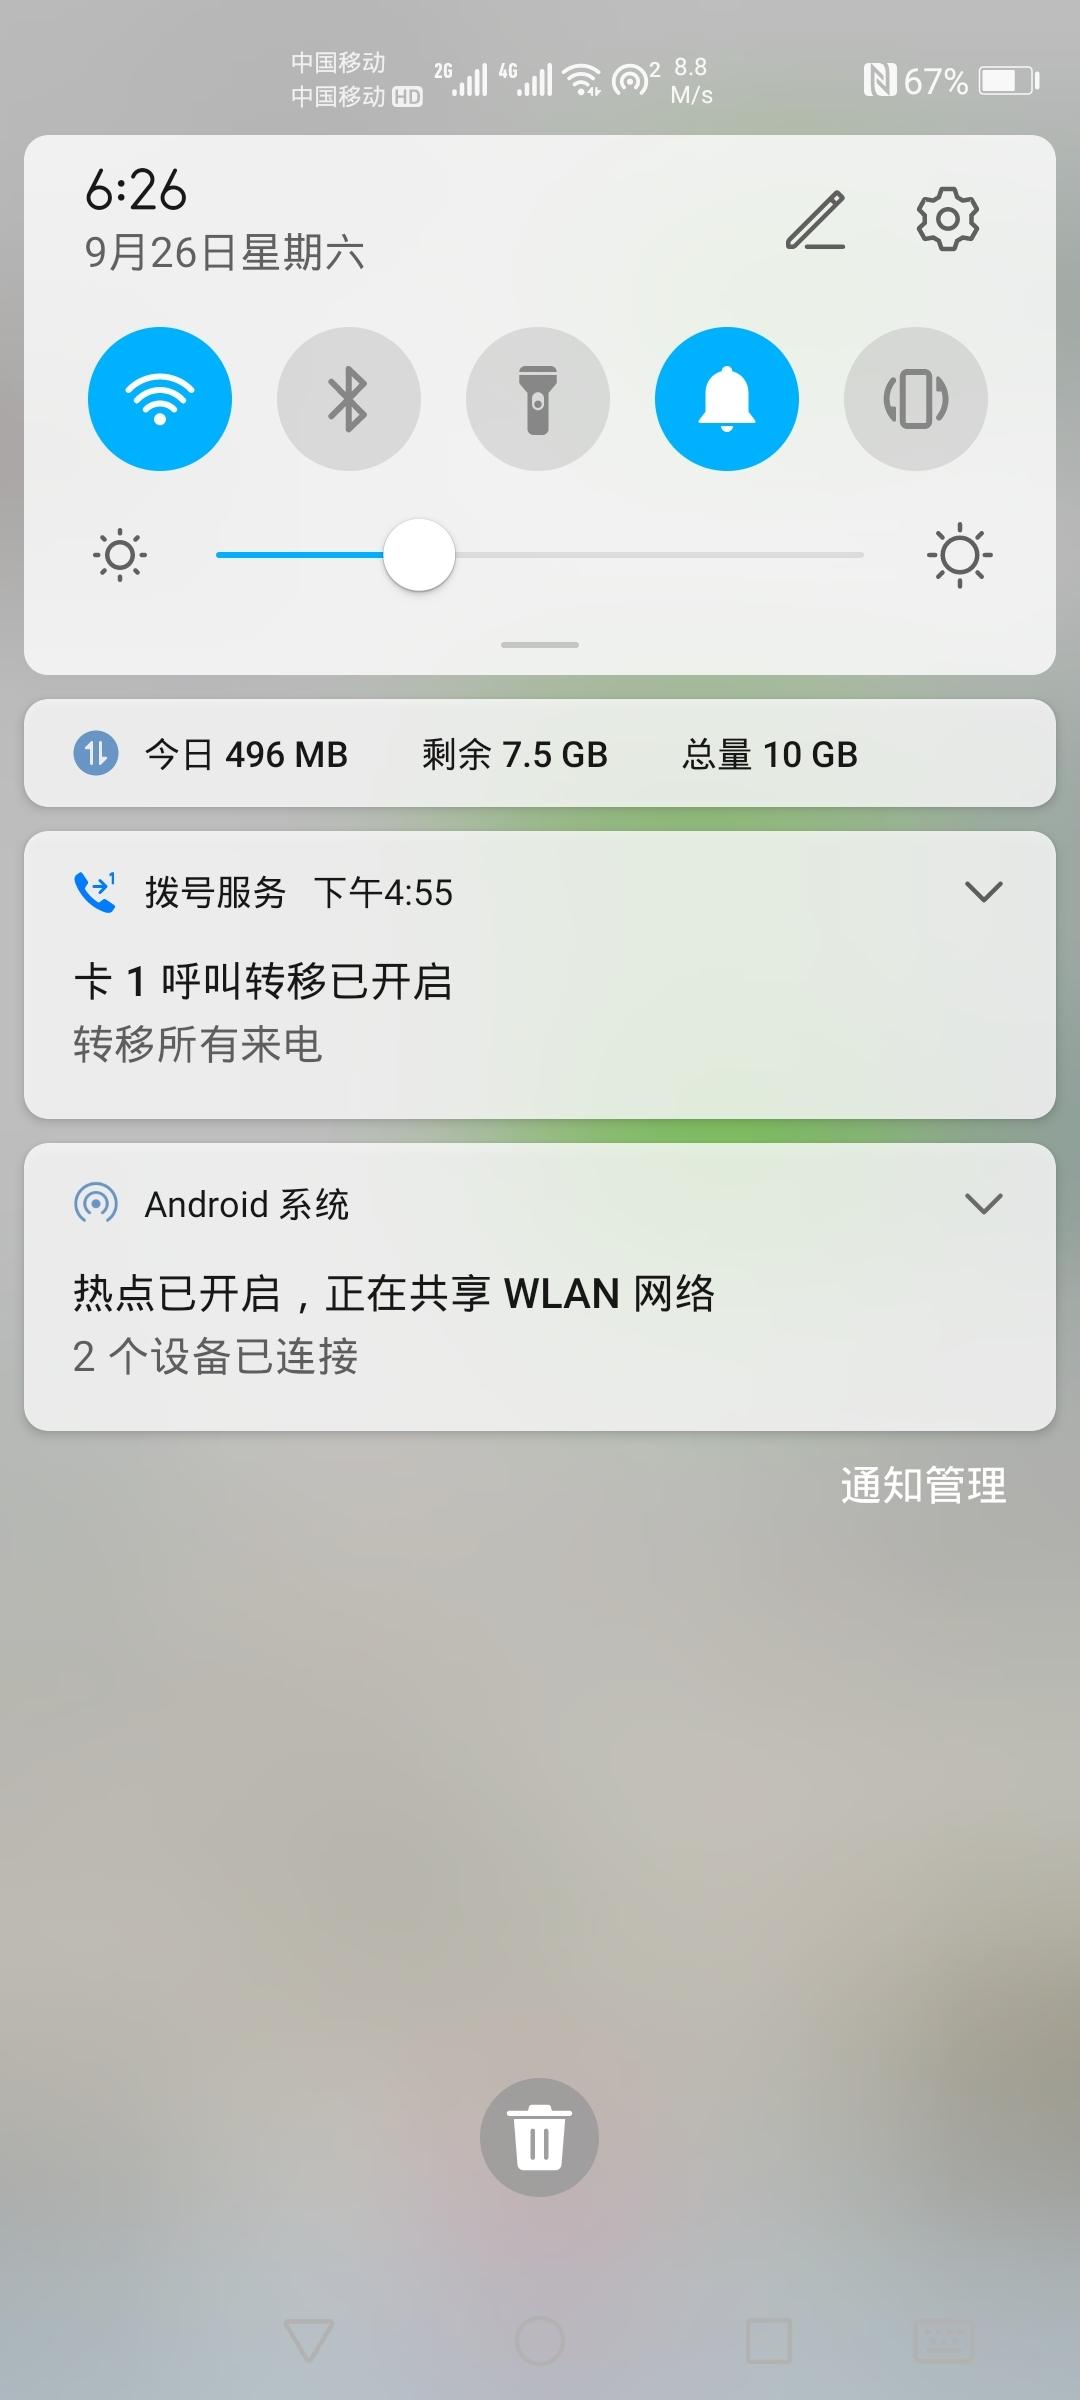 Screenshot_20200926_182627_com.tencent.mm.jpg